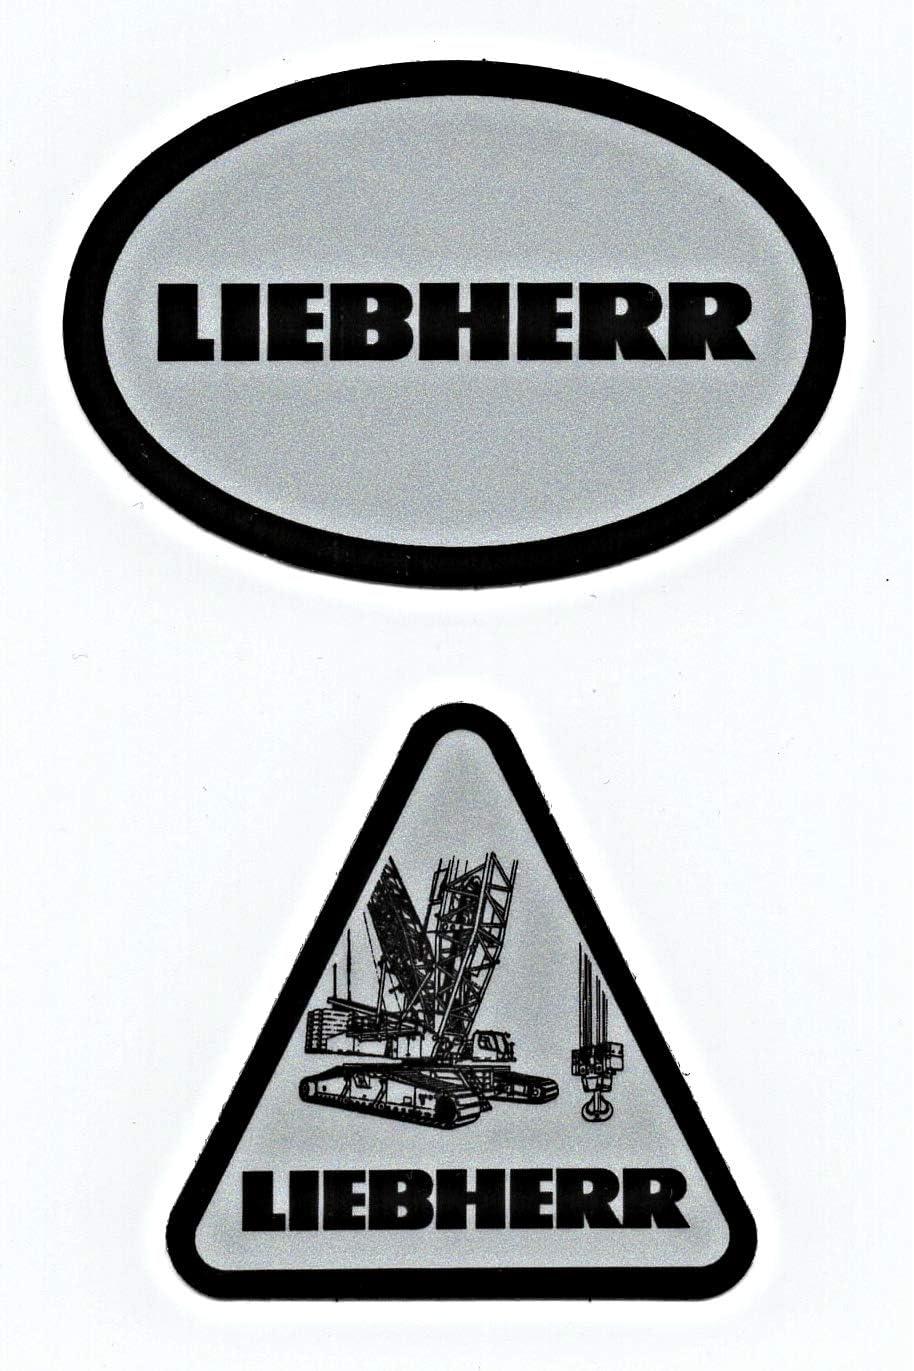 Rare Liebherr lanyard and Sticker set Oilfield Union Construction Crane 3